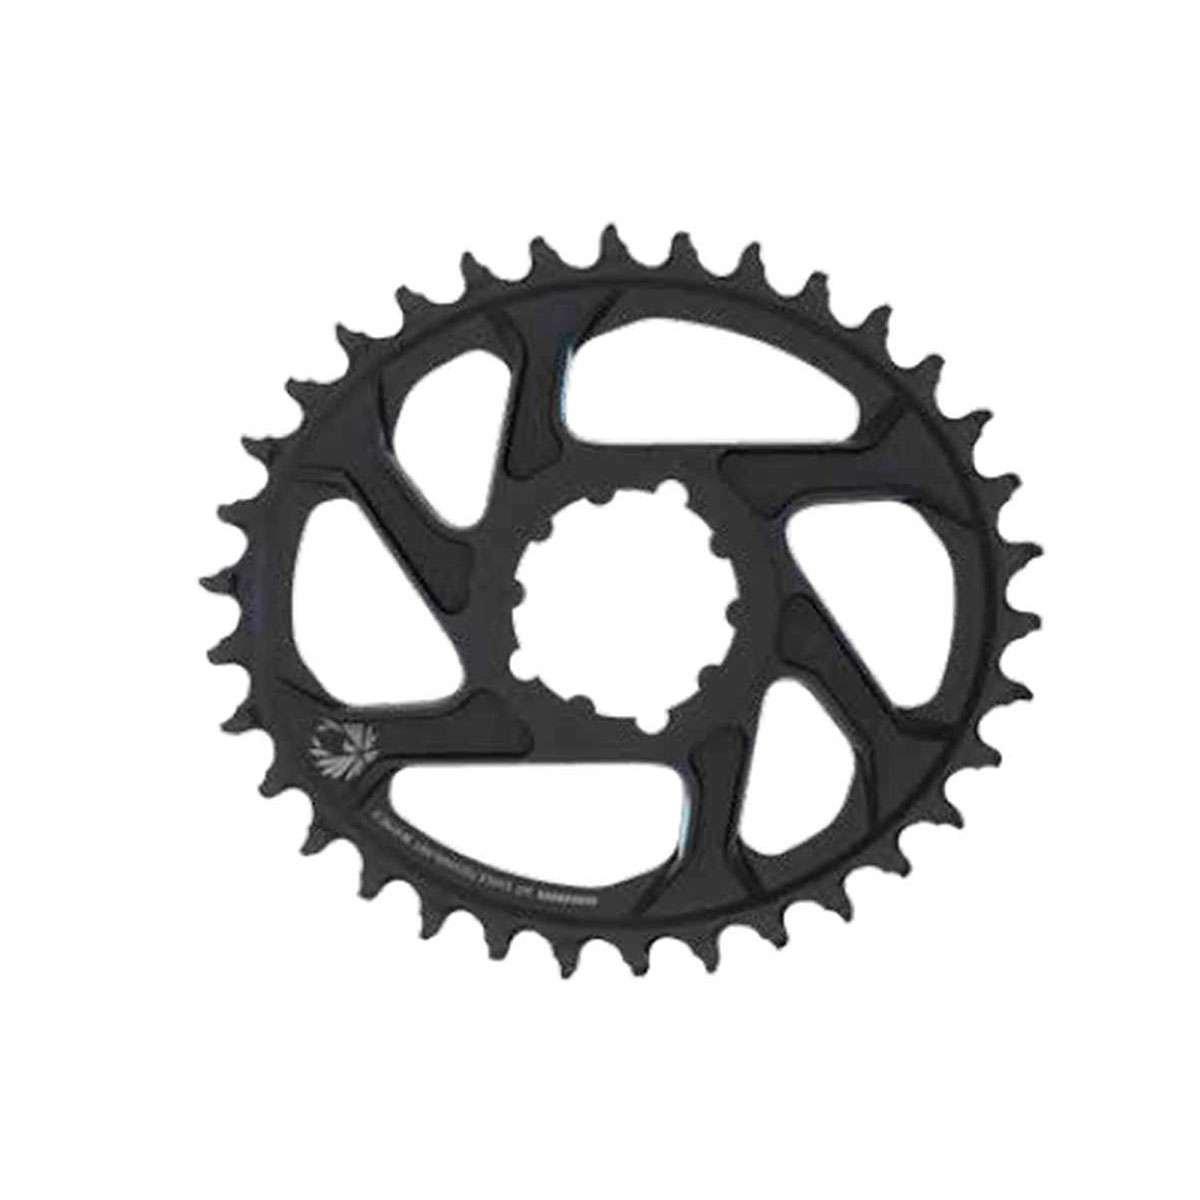 Sram Kettenblatt X-Sync Eagle oval 32T, Direct Mount, Aluminium, schwarz 12-Fach, 6mm Offset, 11.6218.038.010, Standard